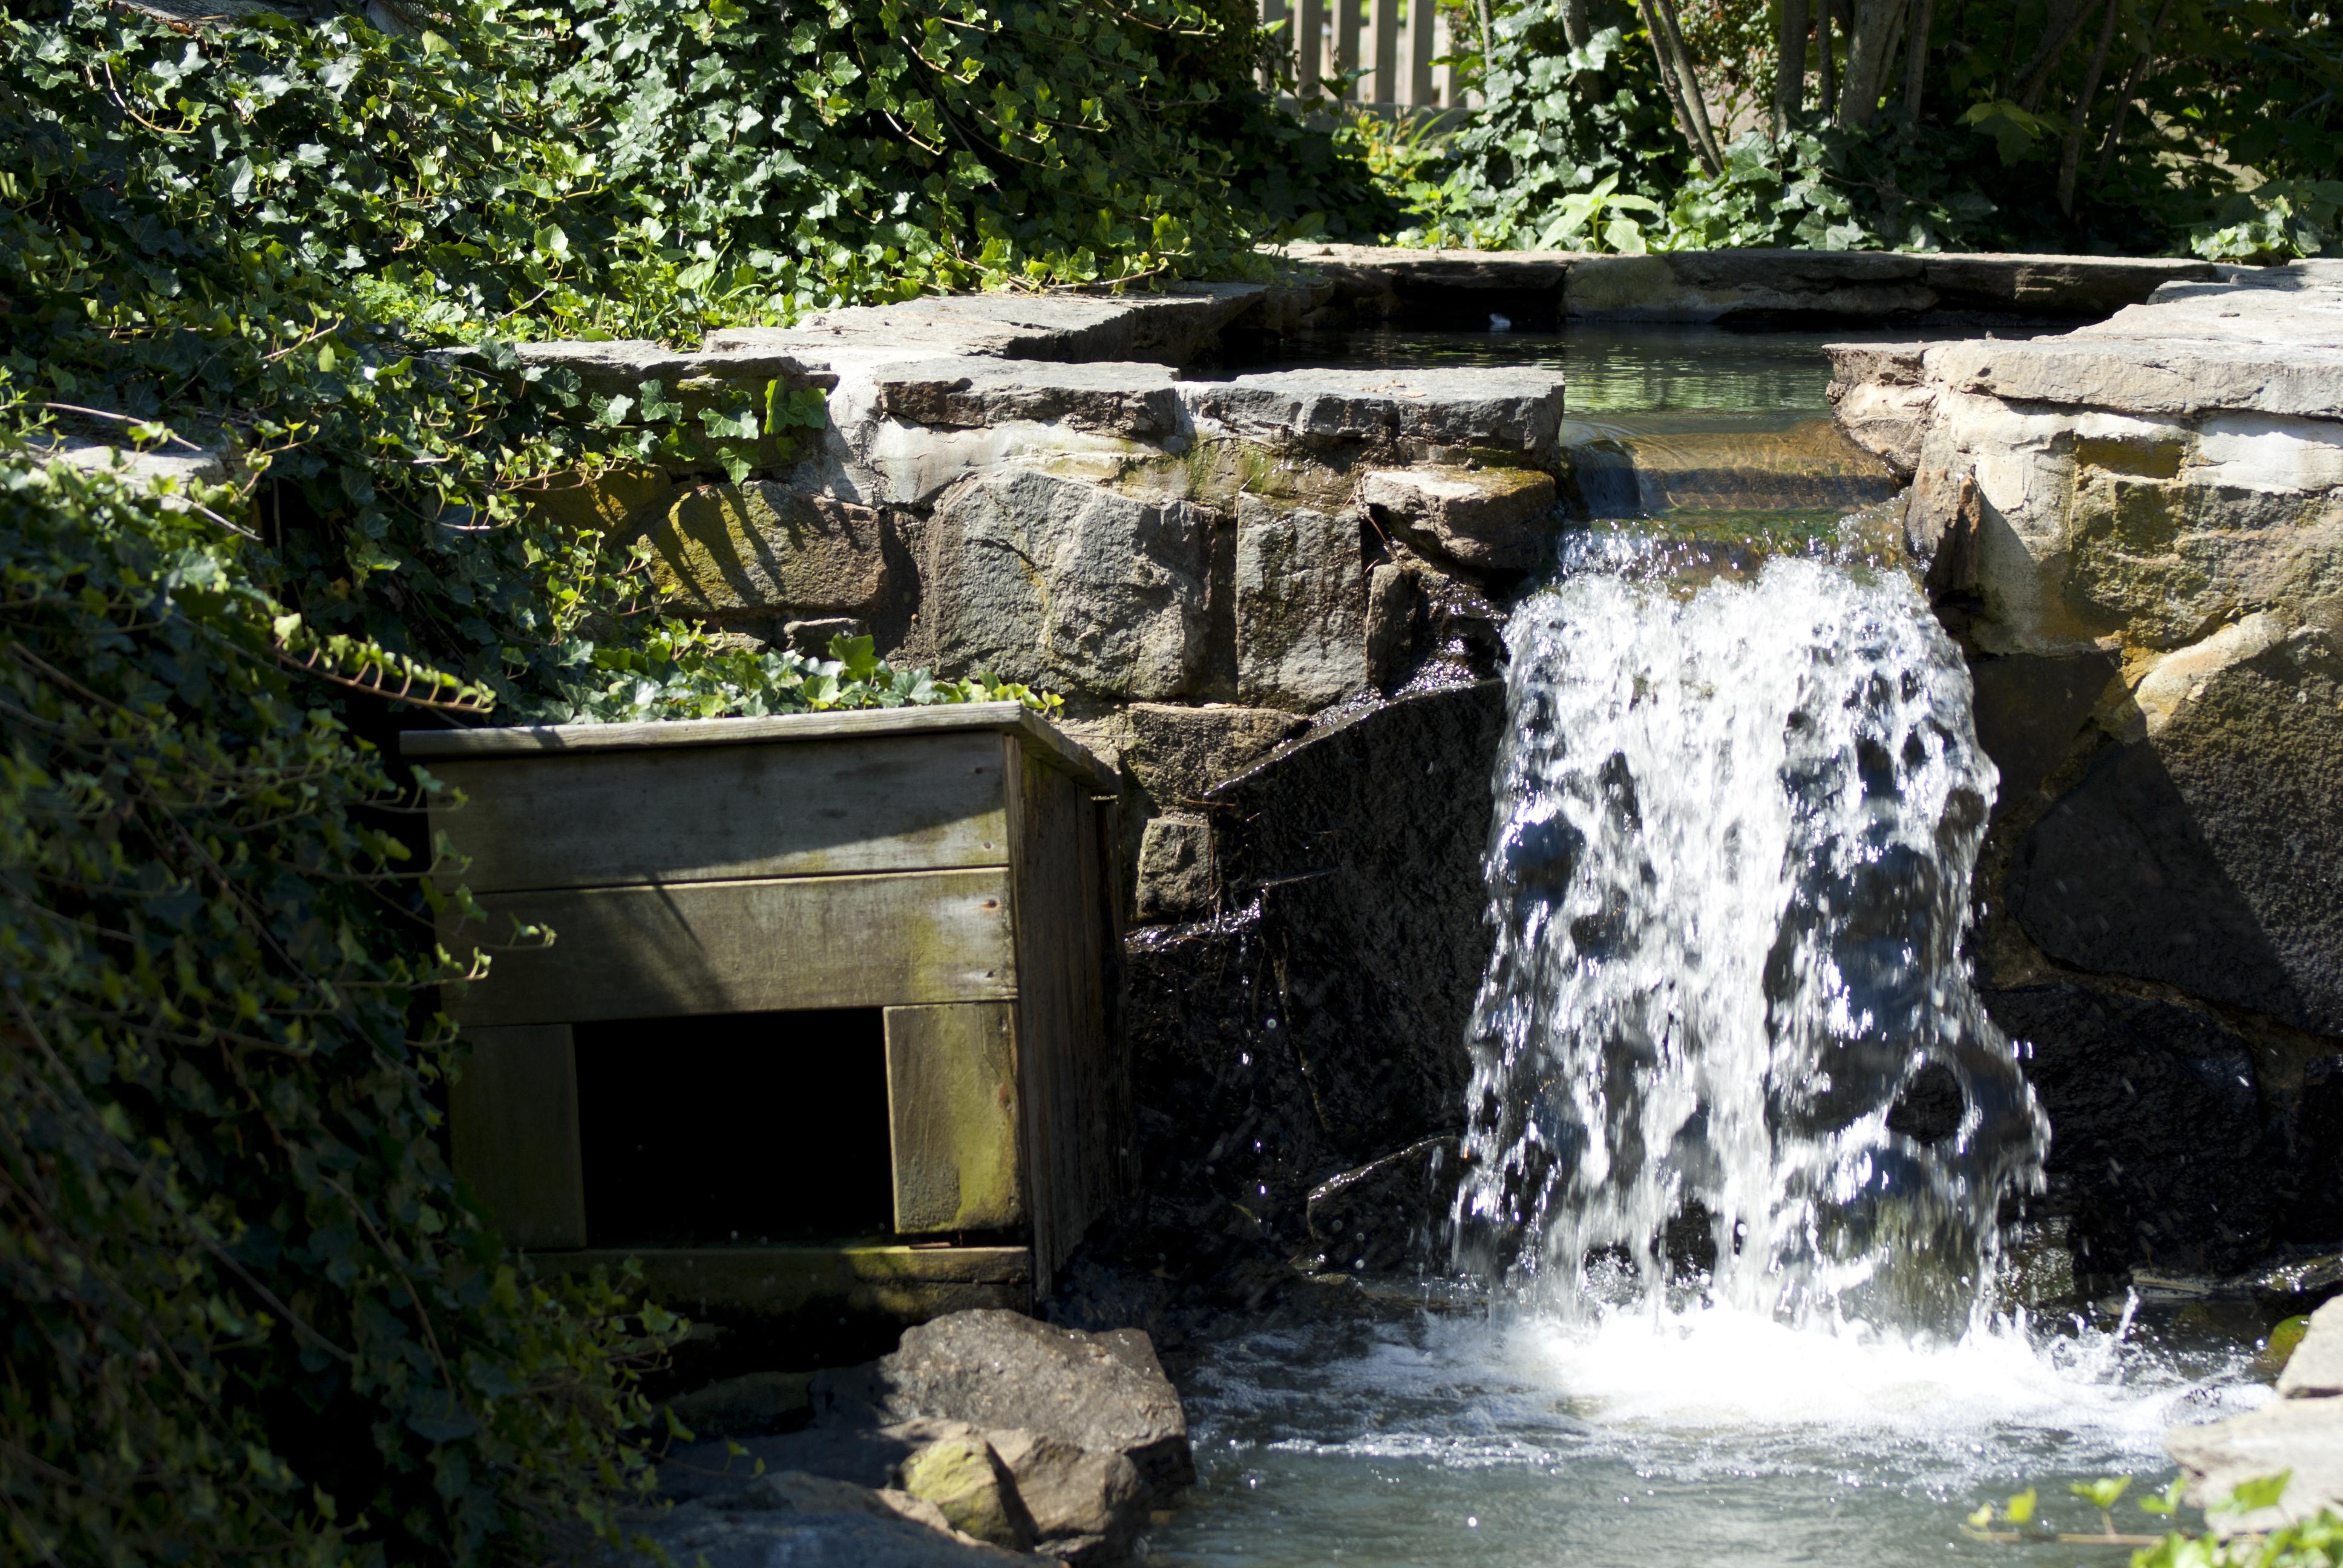 Duck Garden, Brown, Rock, Wet, Waterfall, HQ Photo